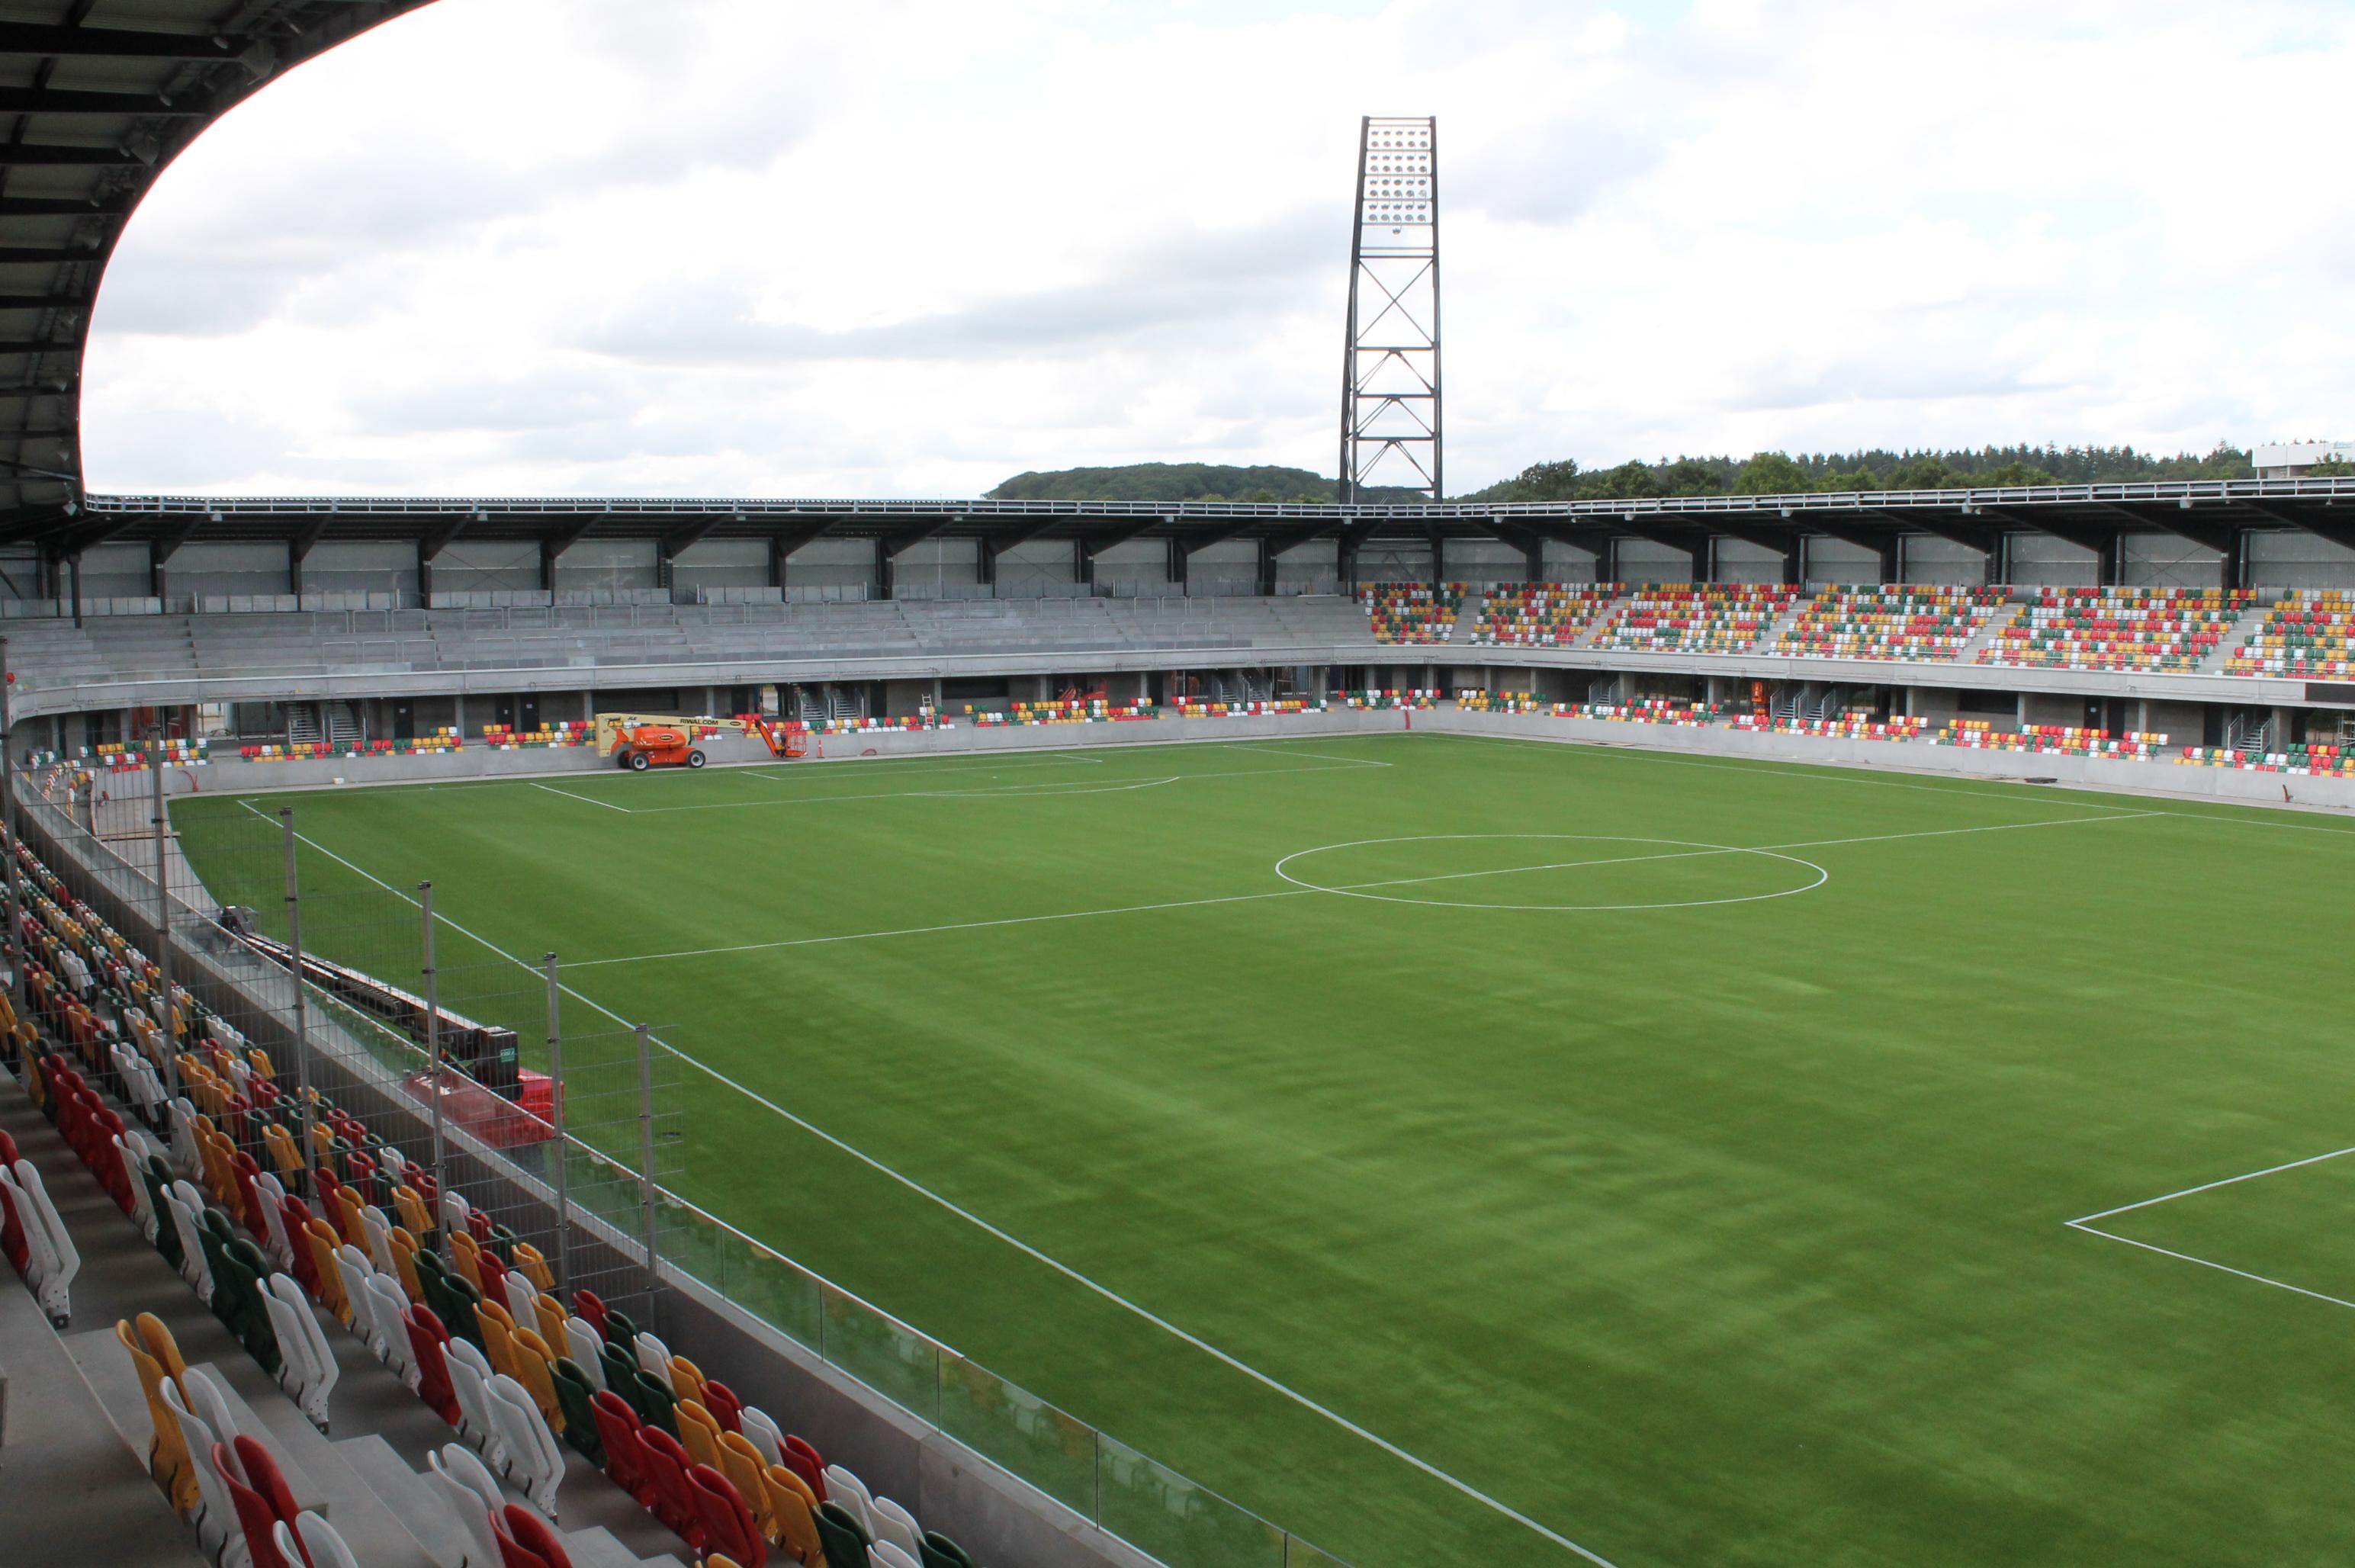 kunstgræs fodbold tribunestole jysk park unisport